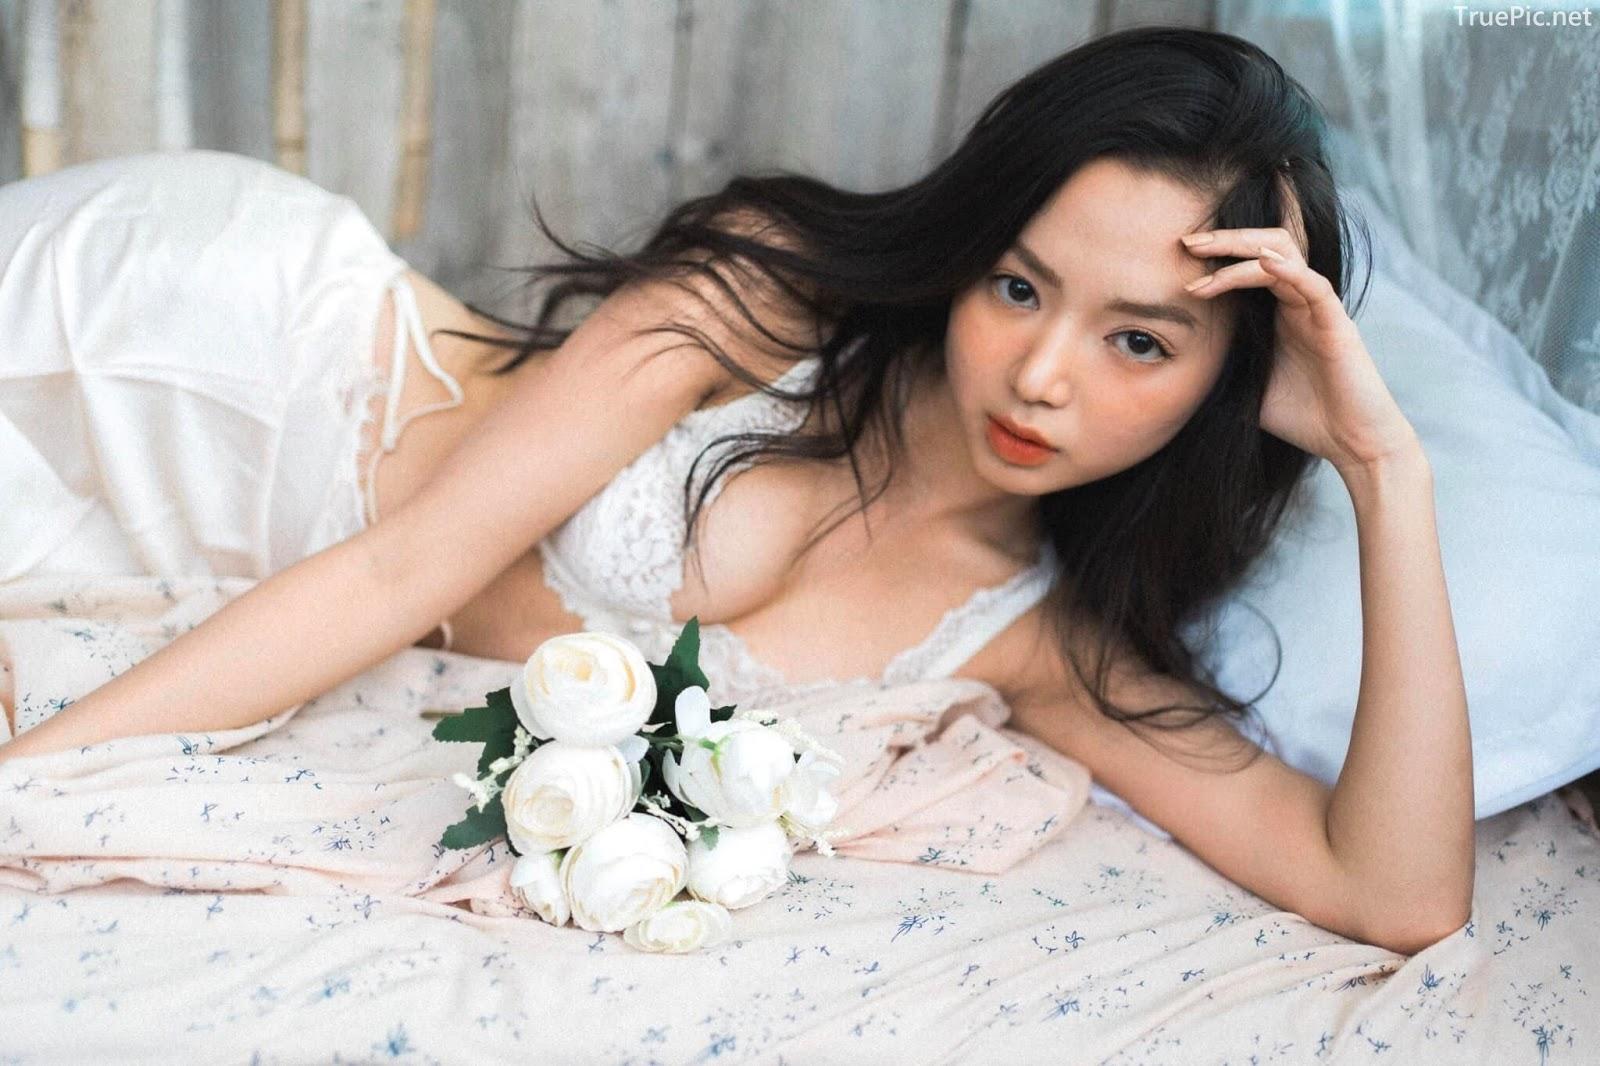 Vietnamese Sexy Model - Vu Ngoc Kim Chi - Beautiful in white - TruePic.net- Picture 25